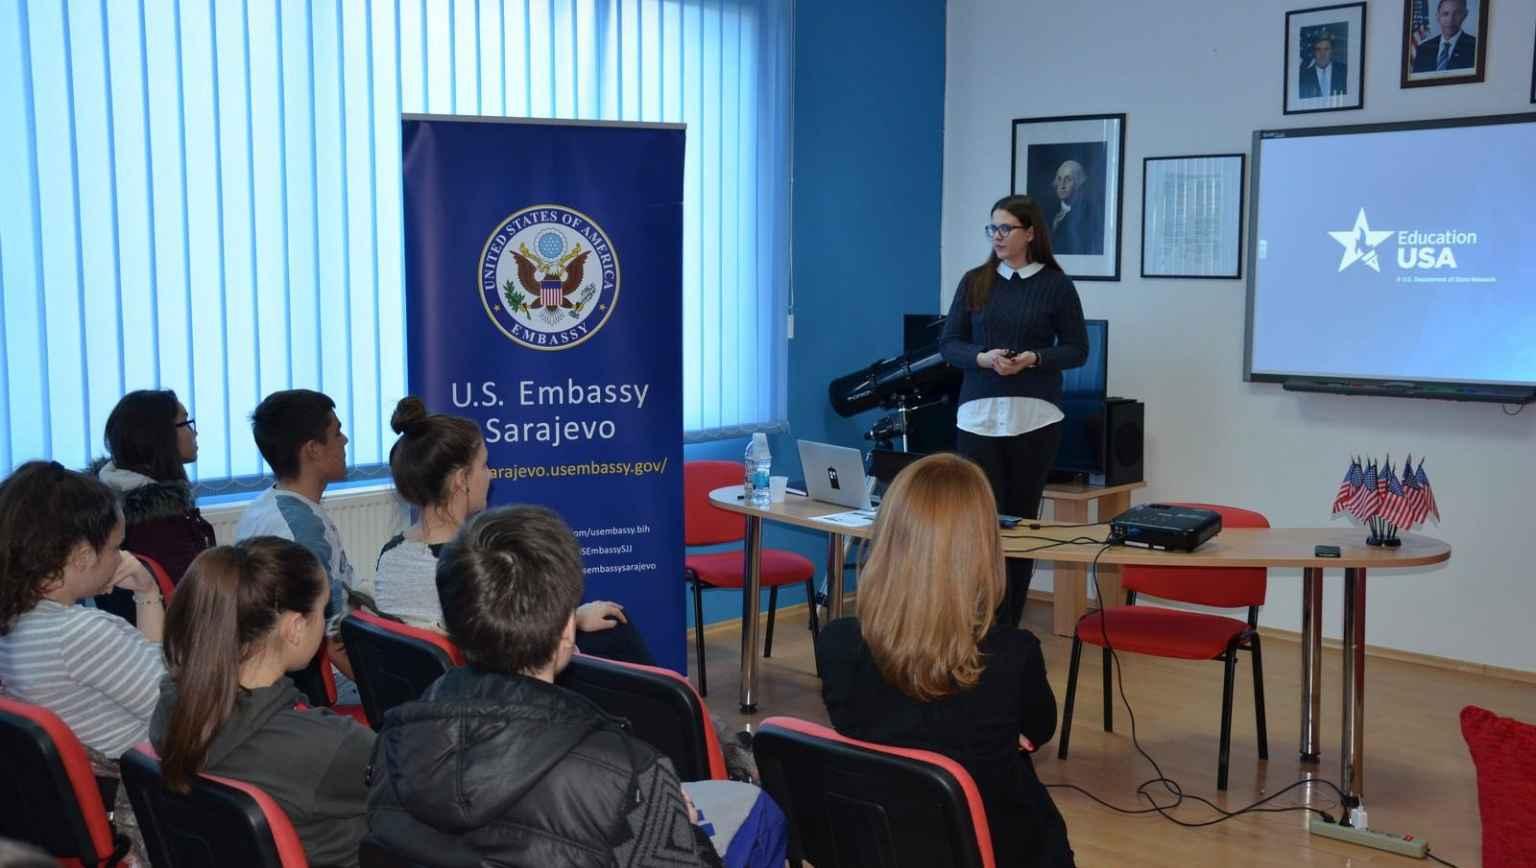 EducationUSA Tuzla in Doboj during IEW2016